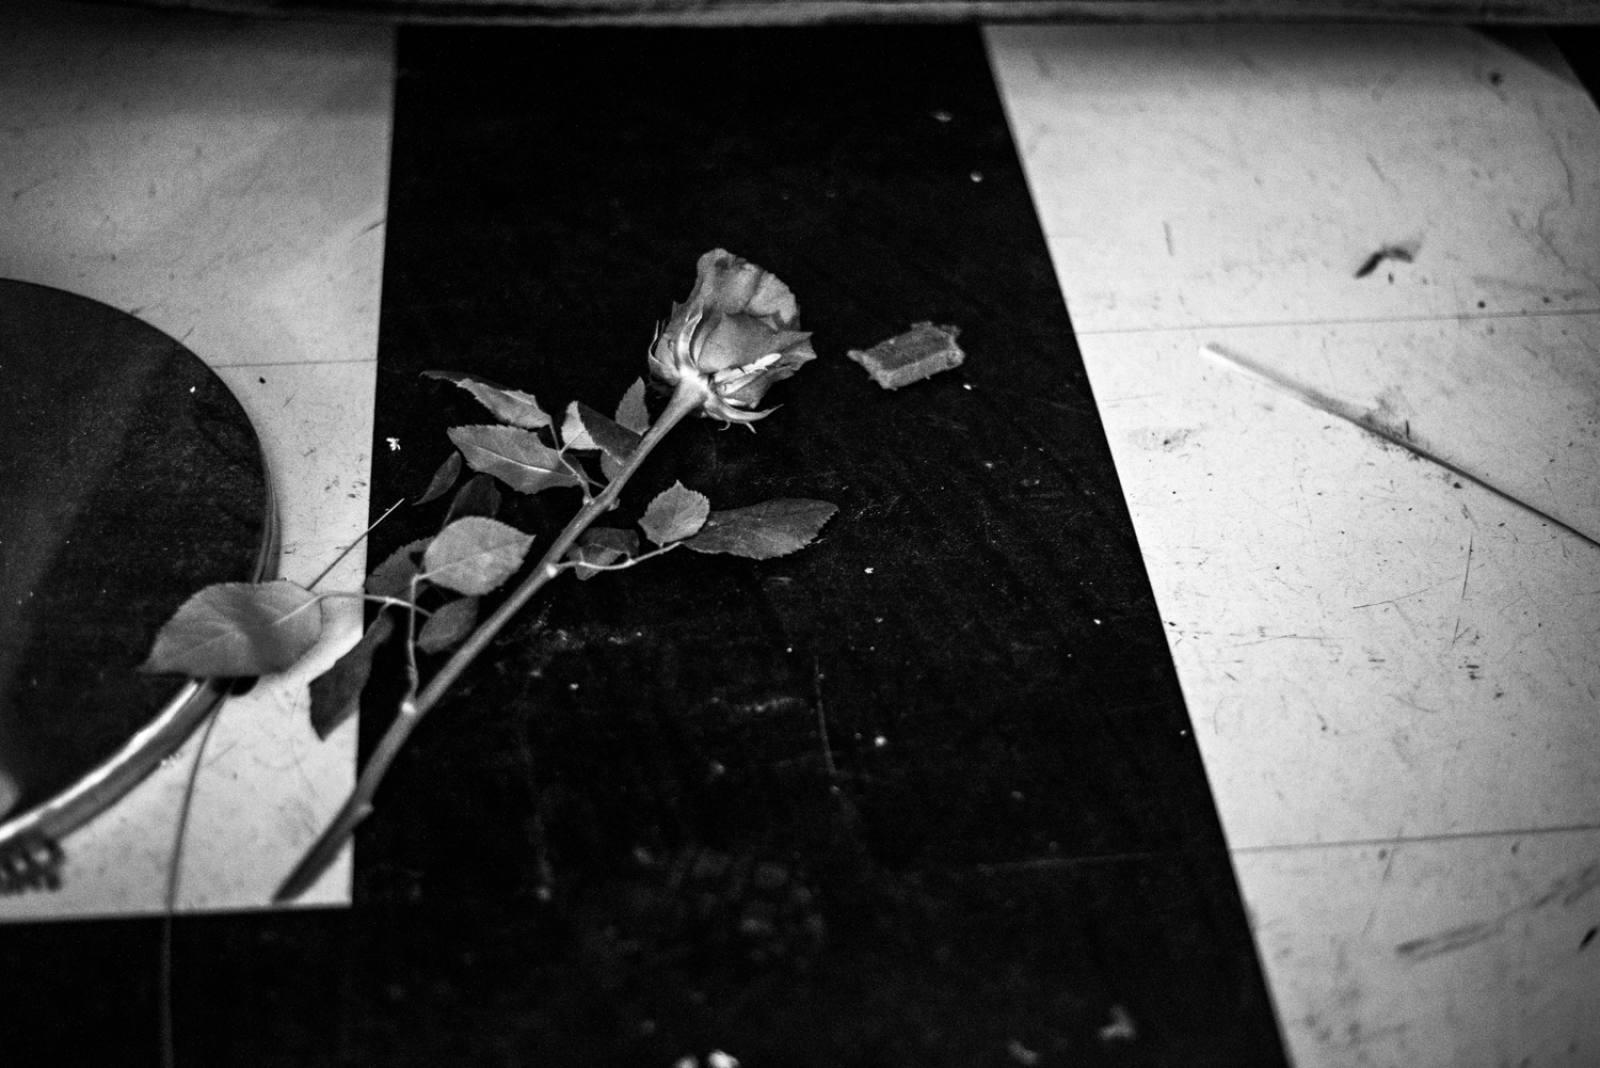 Funerale-Pannella-08,medium_large.2x.1464193799